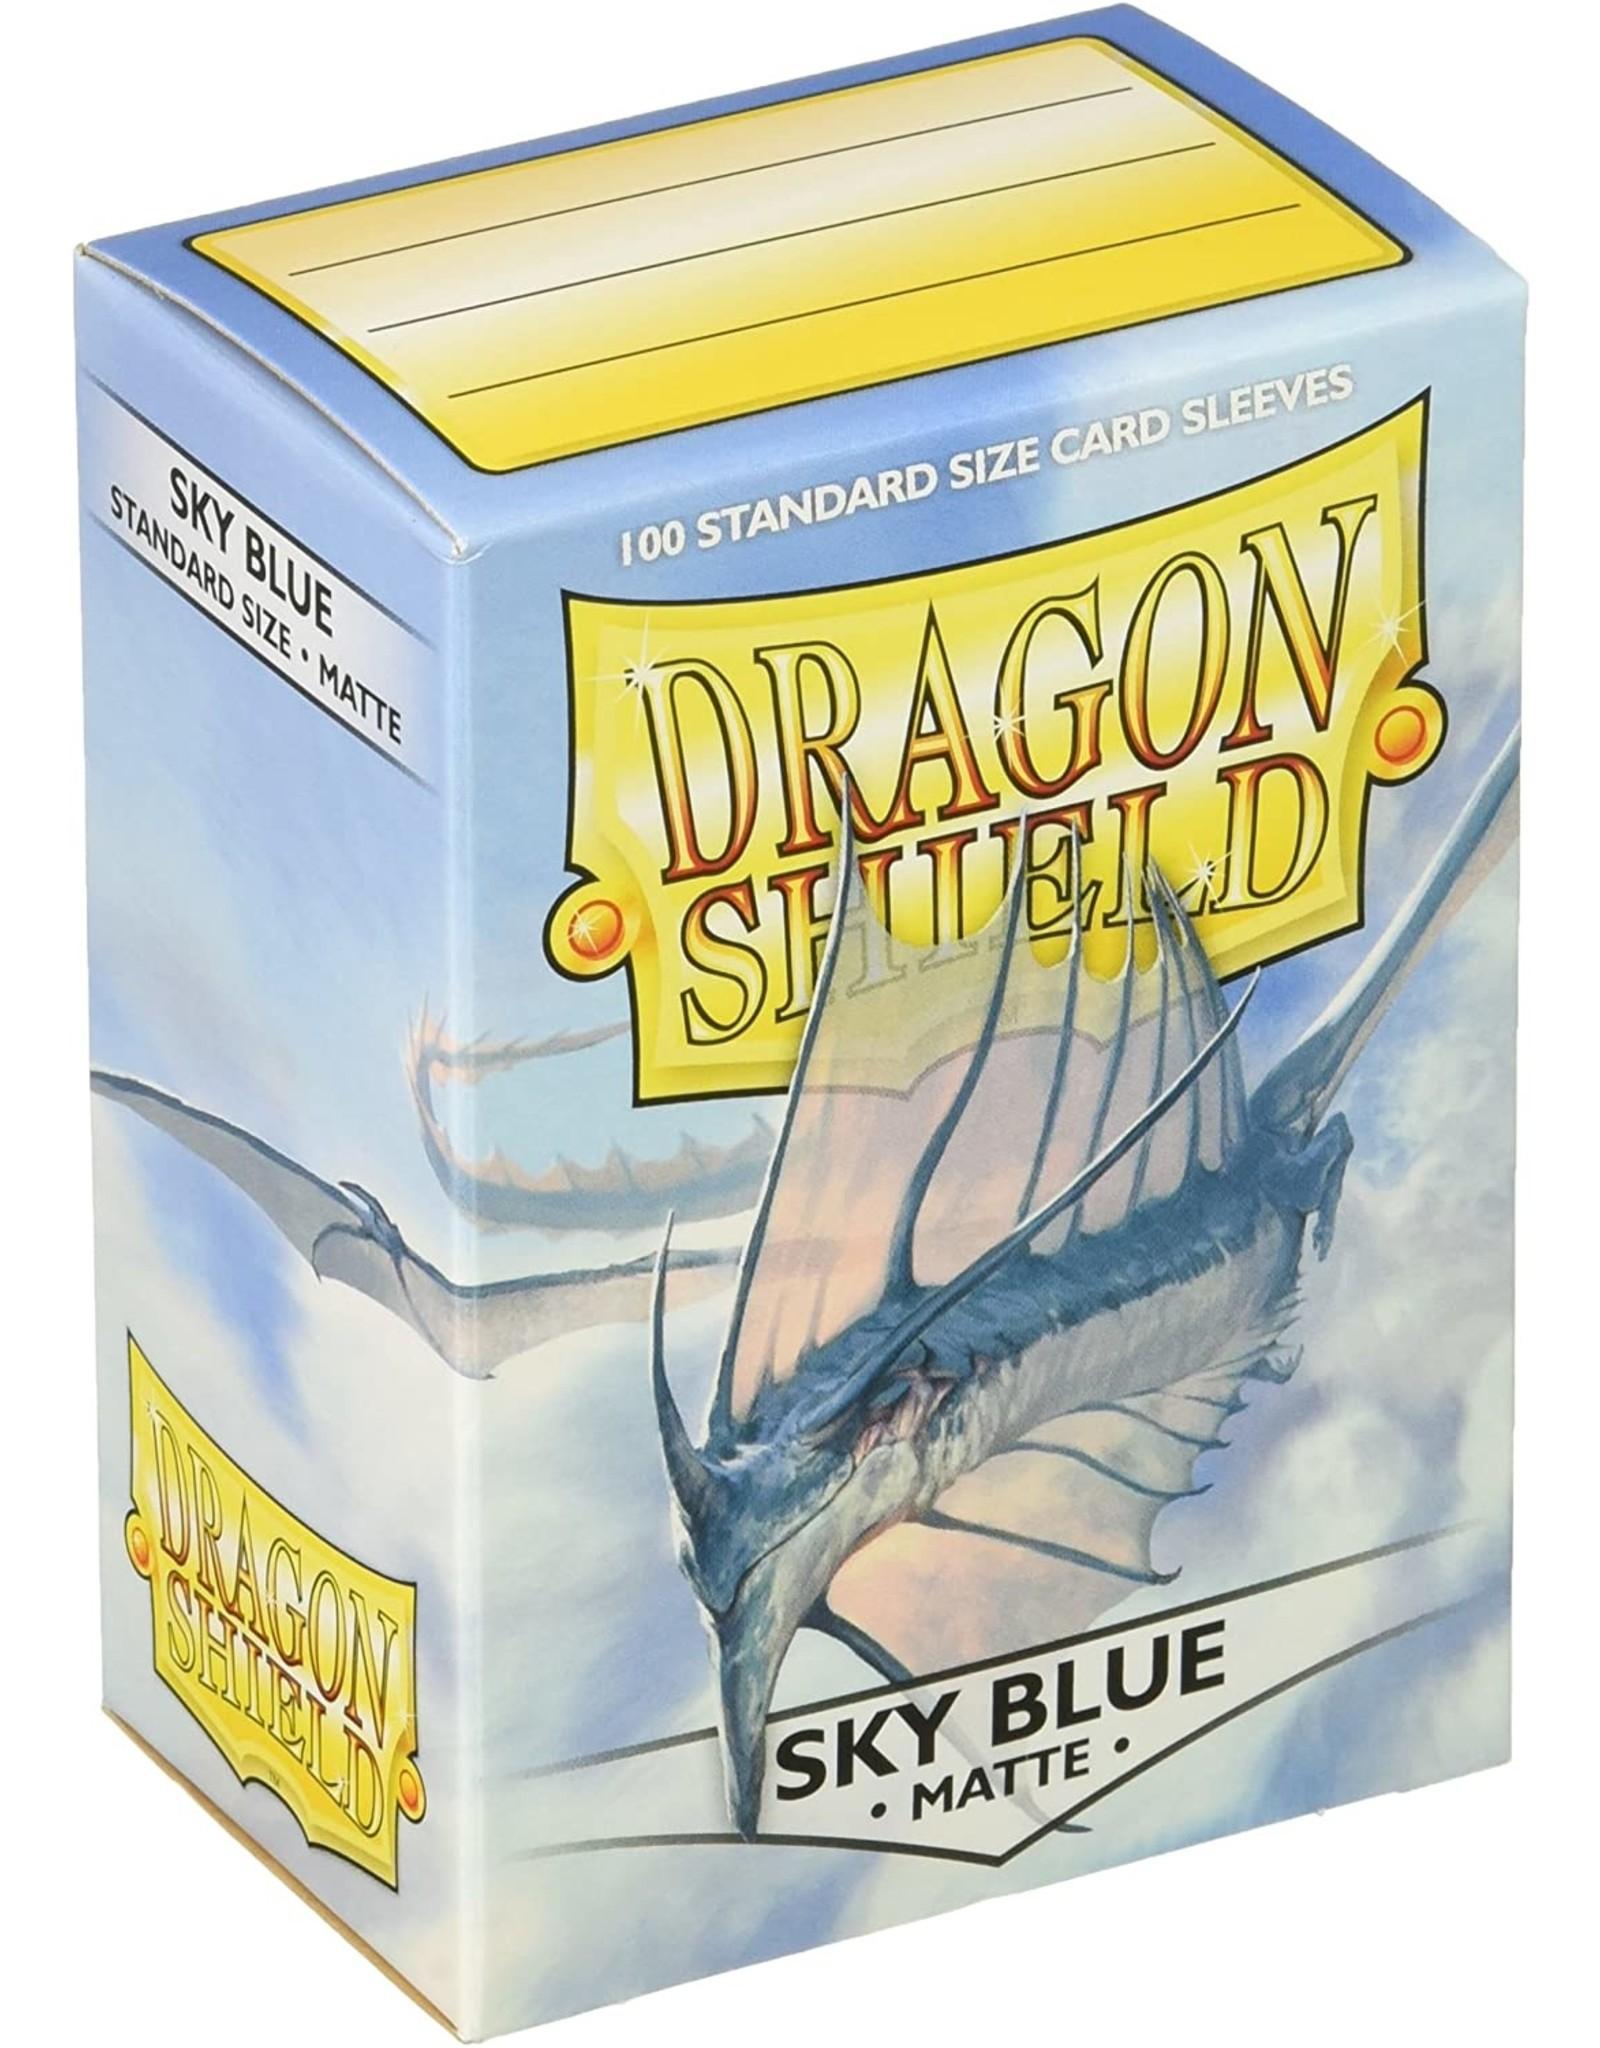 DRAGON SHIELD 100 CT SLEEVES MATTE SKY BLUE